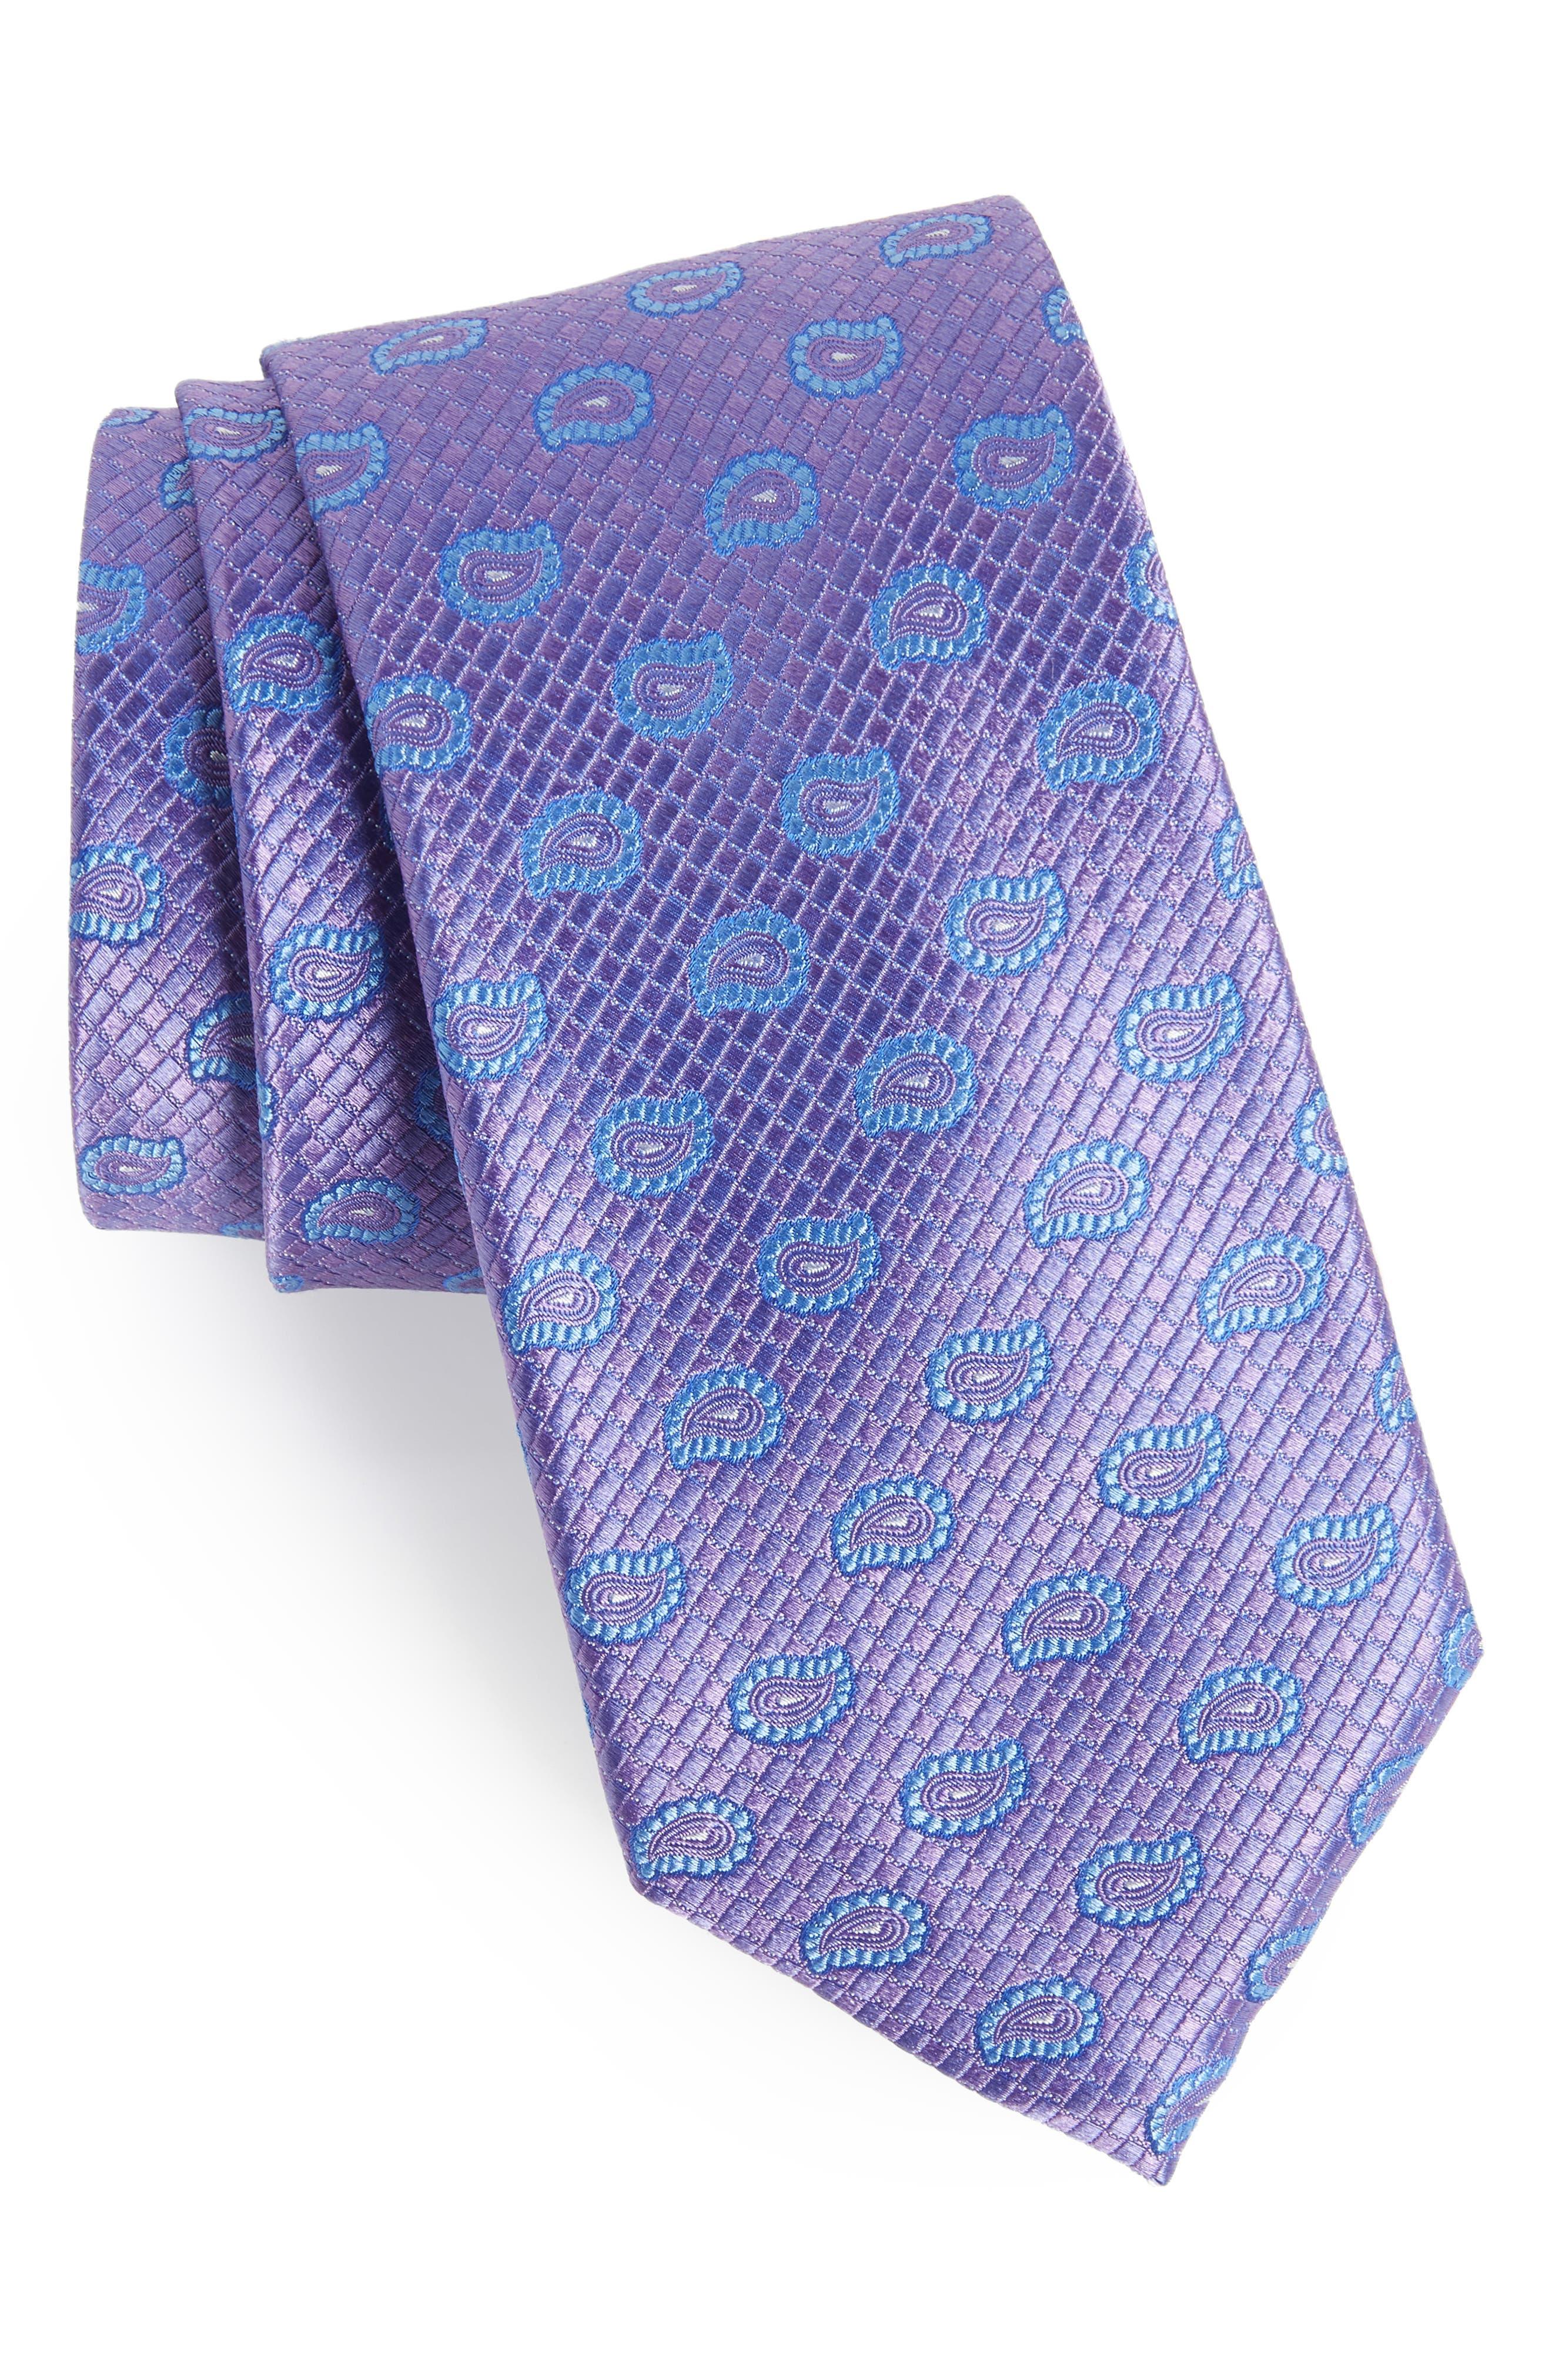 Clarksonton Paisley Silk Tie,                             Main thumbnail 1, color,                             LILAC